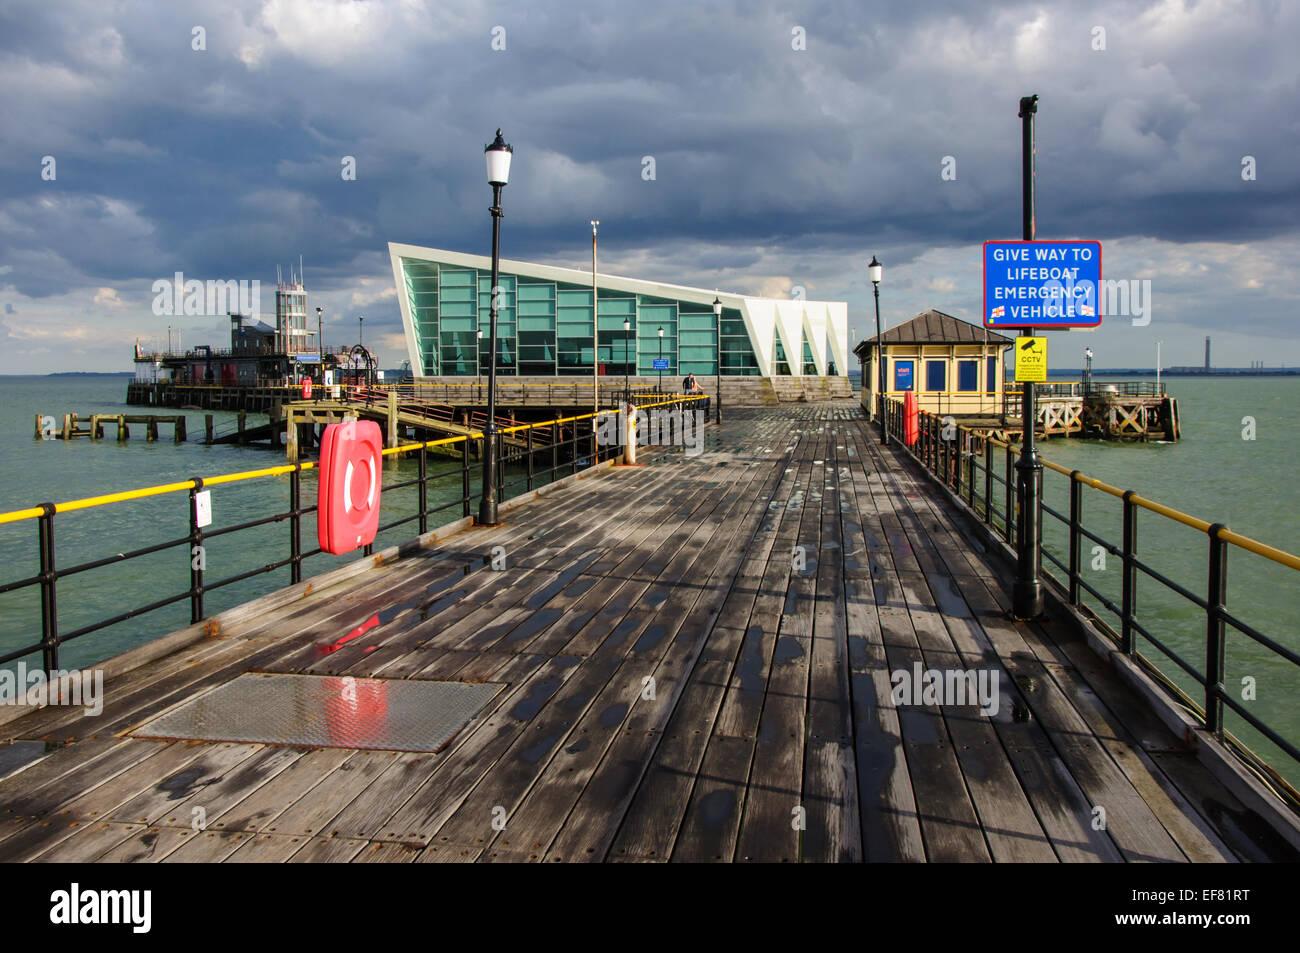 Southend-on-Sea pier. - Stock Image